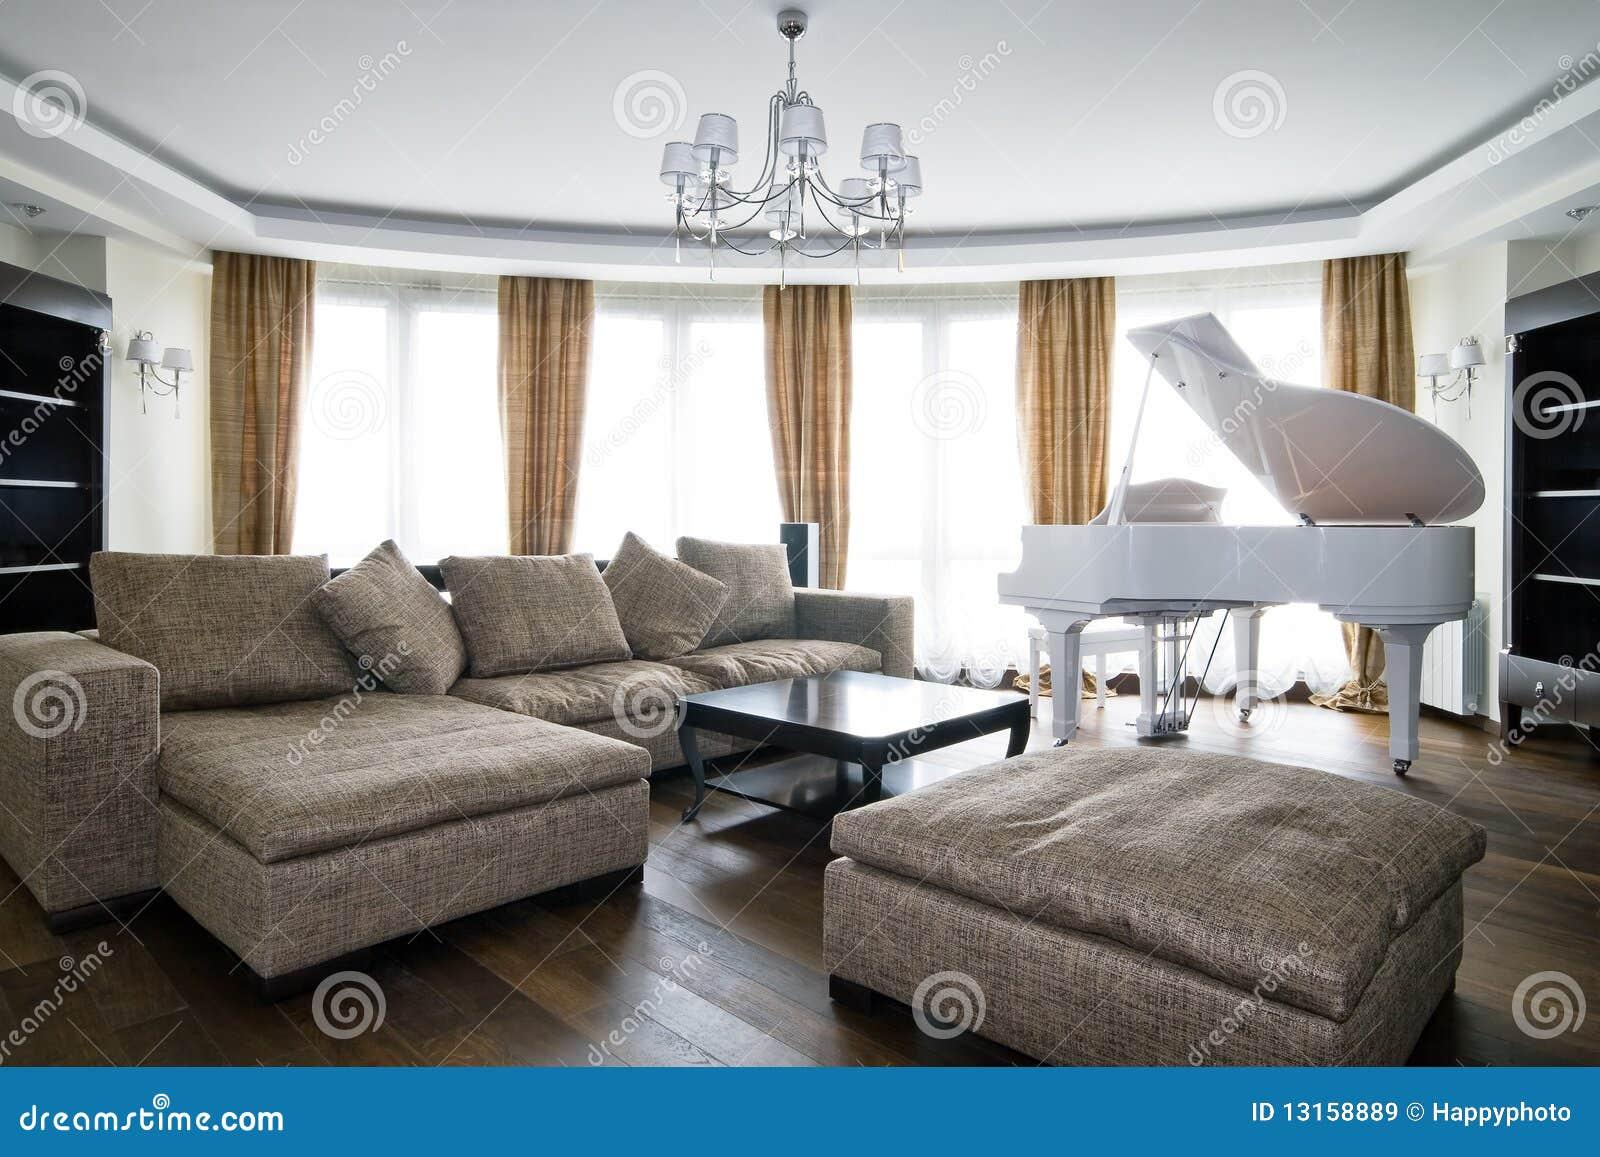 Interior of light living room with white piano stock image for White light for living room